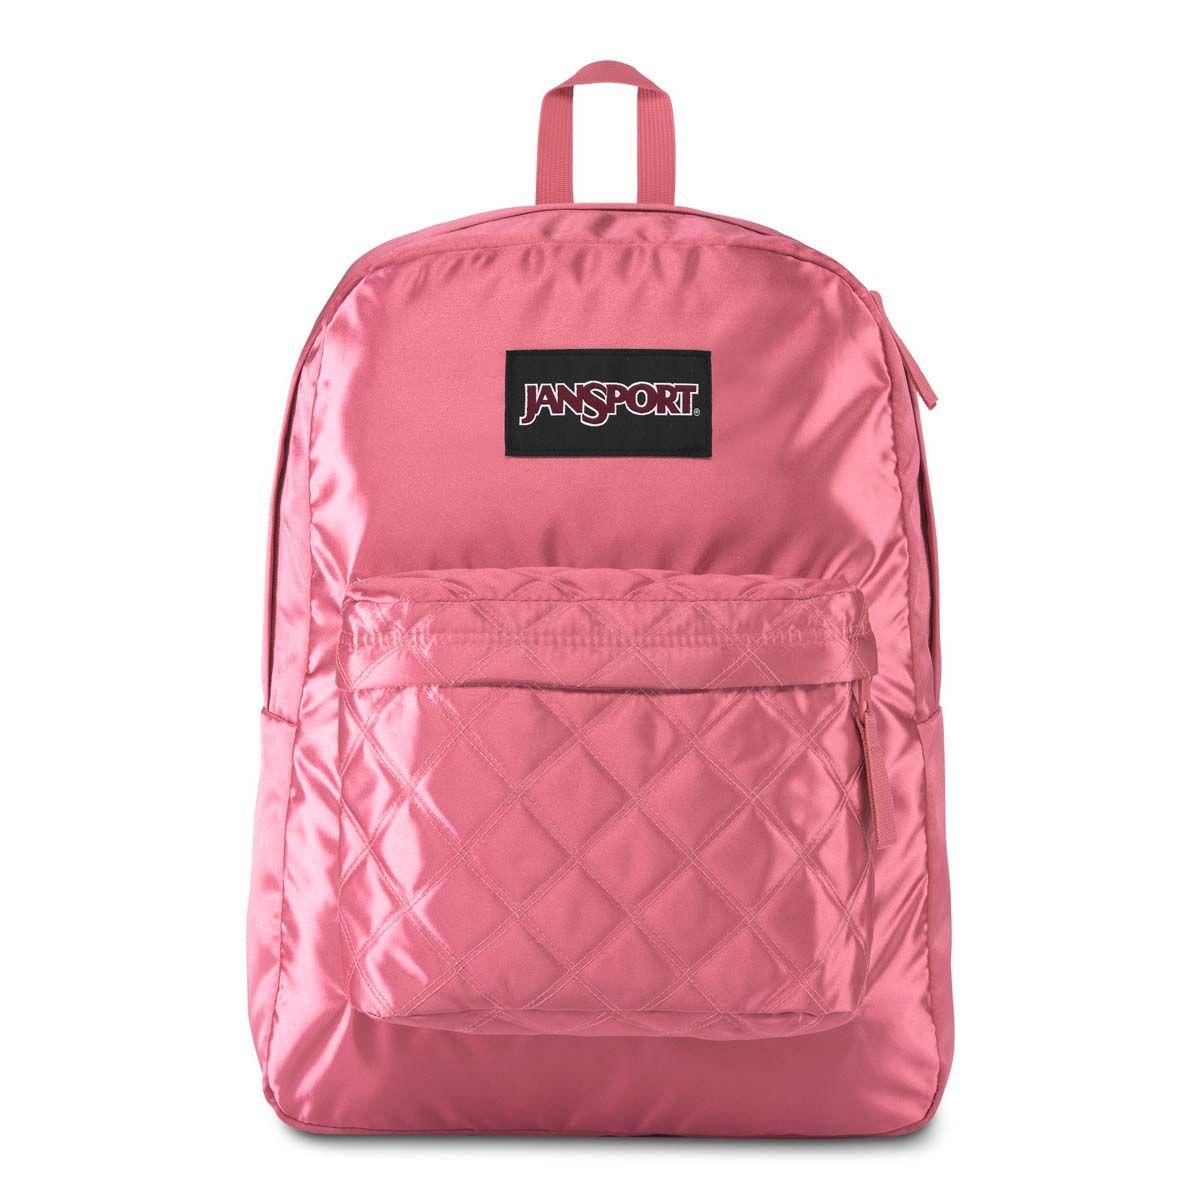 JanSport Super FX Backpack in Slate Rose Diamond Quilting